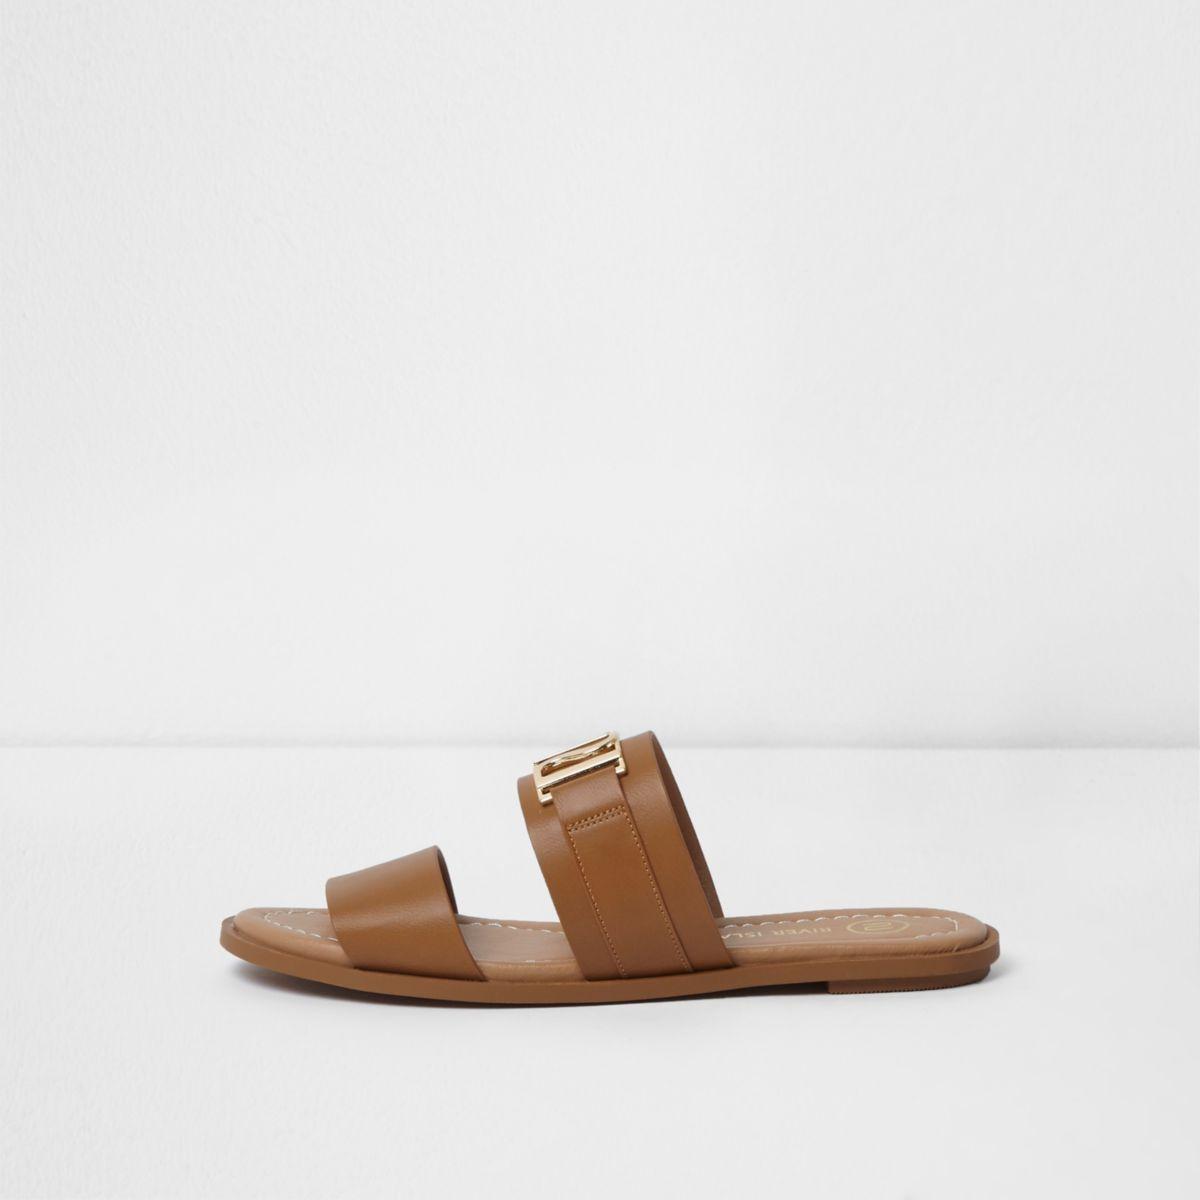 Tan double strap flat mules